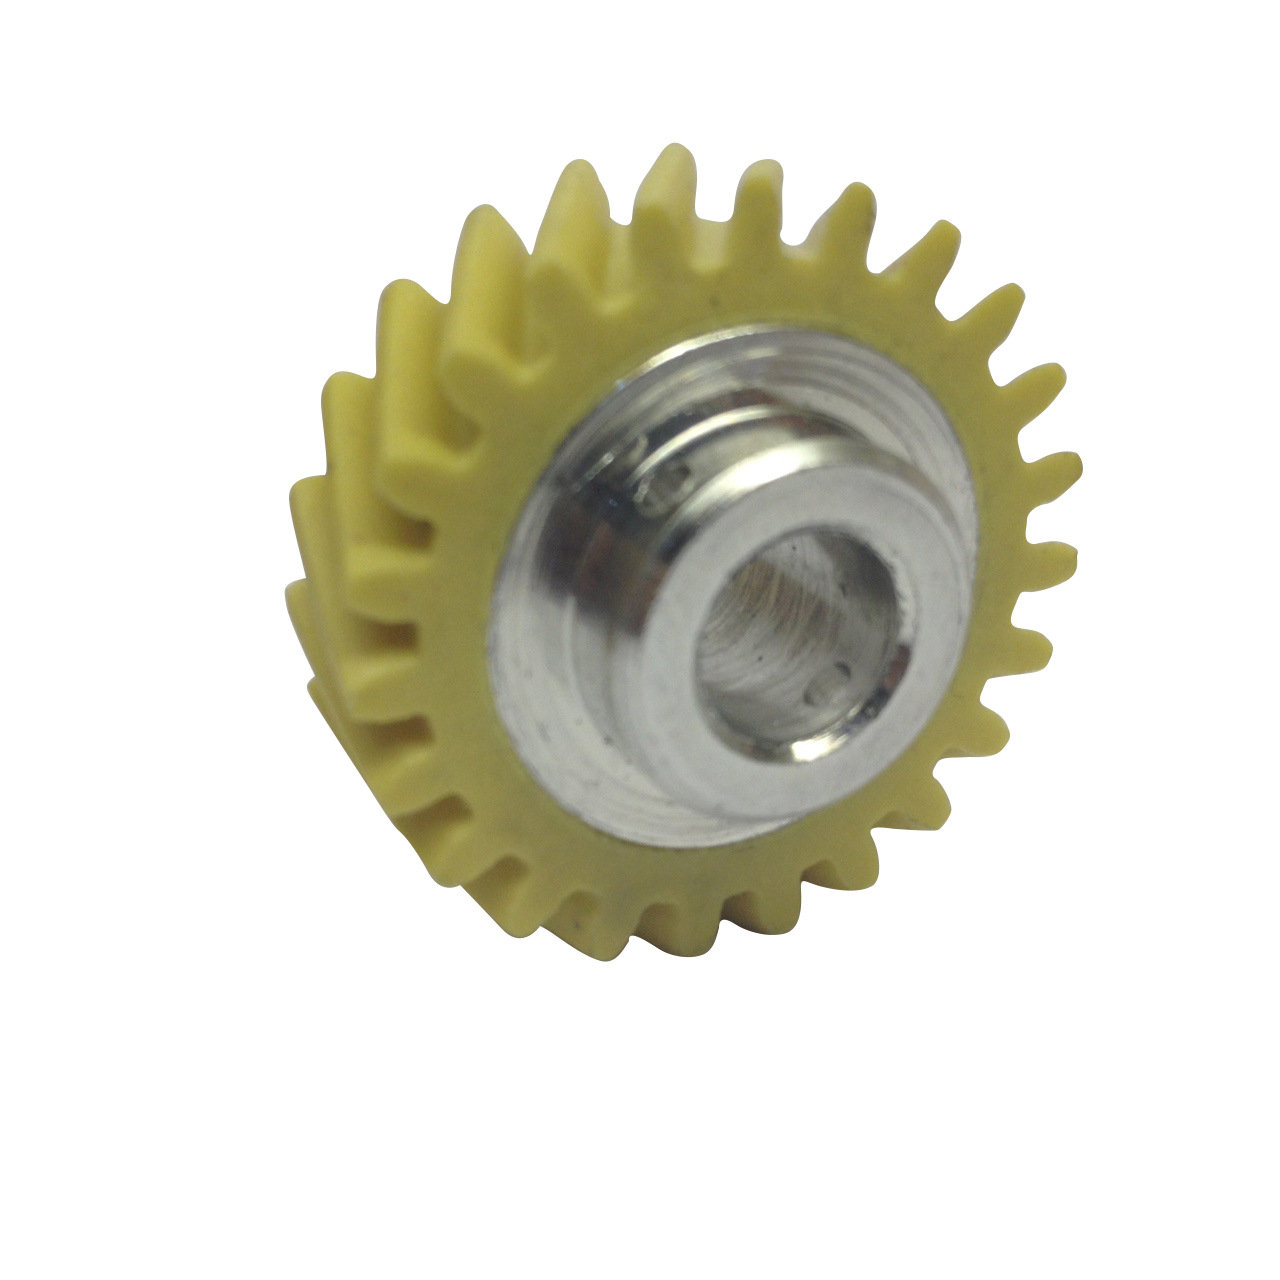 Kitchenaid stand mixer worm drive gear w10112253 lana 39 s kenwood kitchenaid spares - Kitchenaid blender parts uk ...